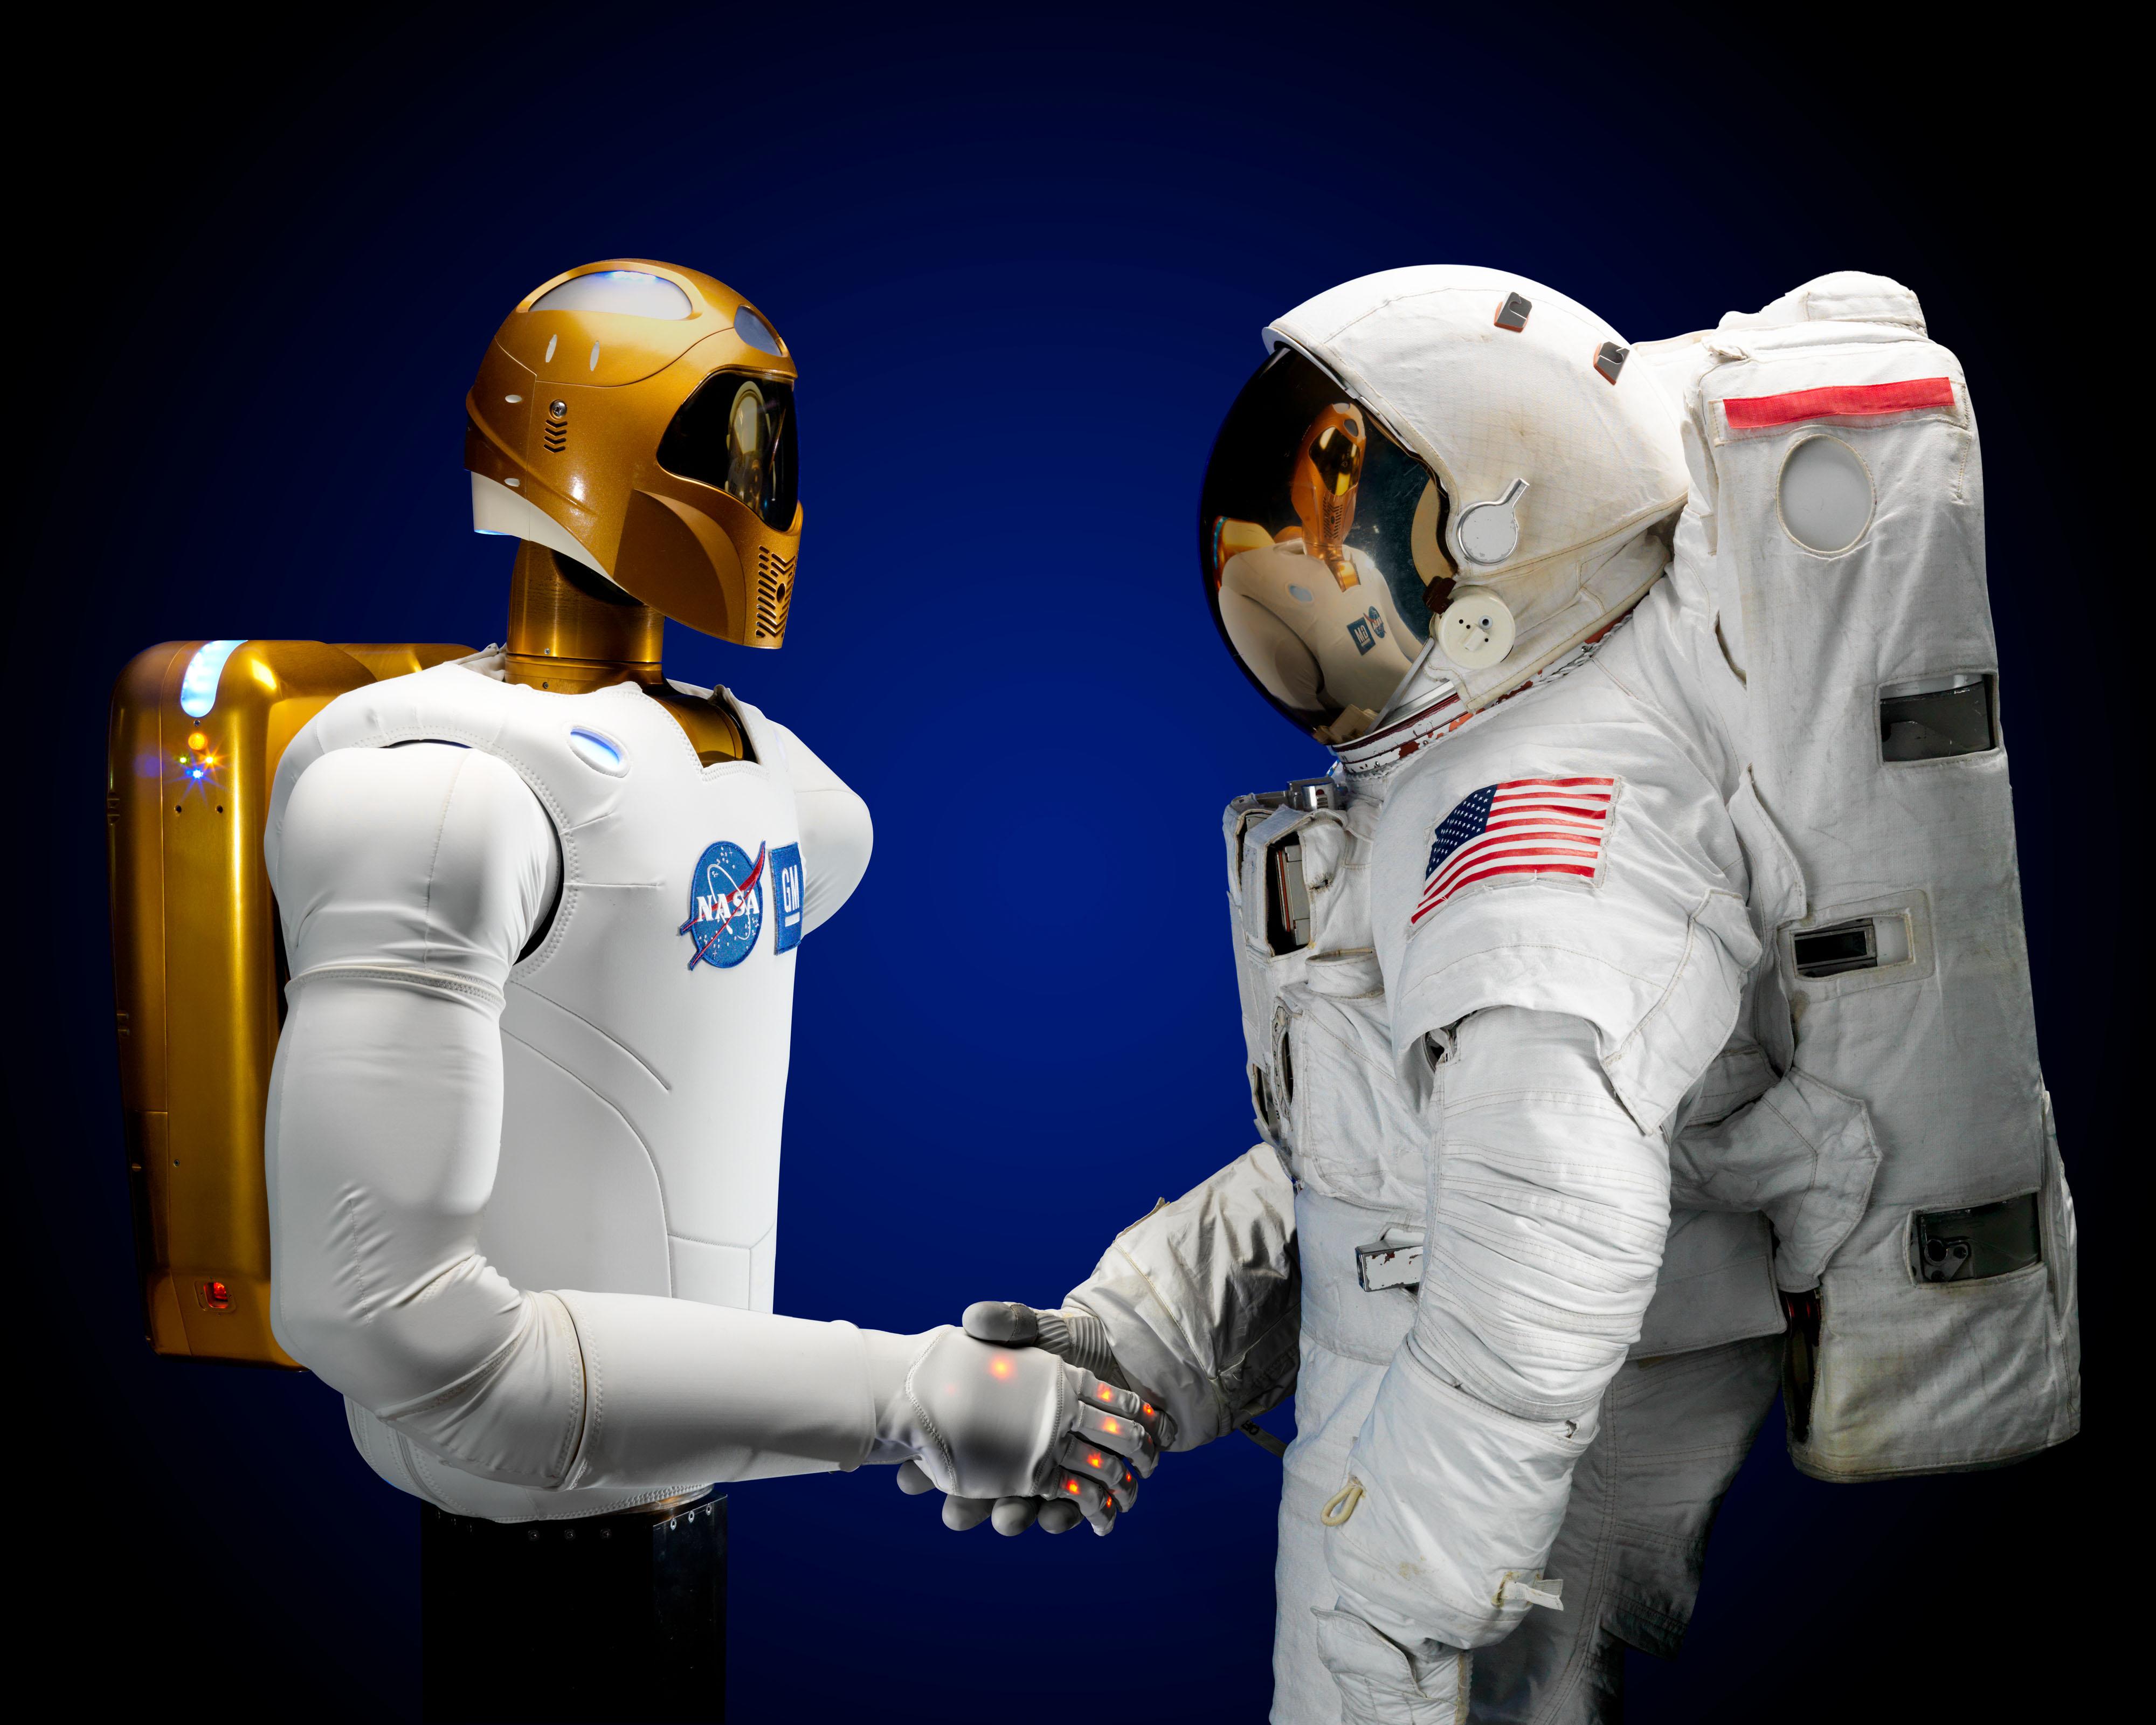 NASA Langley Celebrates 100 Years of Innovation at Hampton Roads Mini Maker Faire